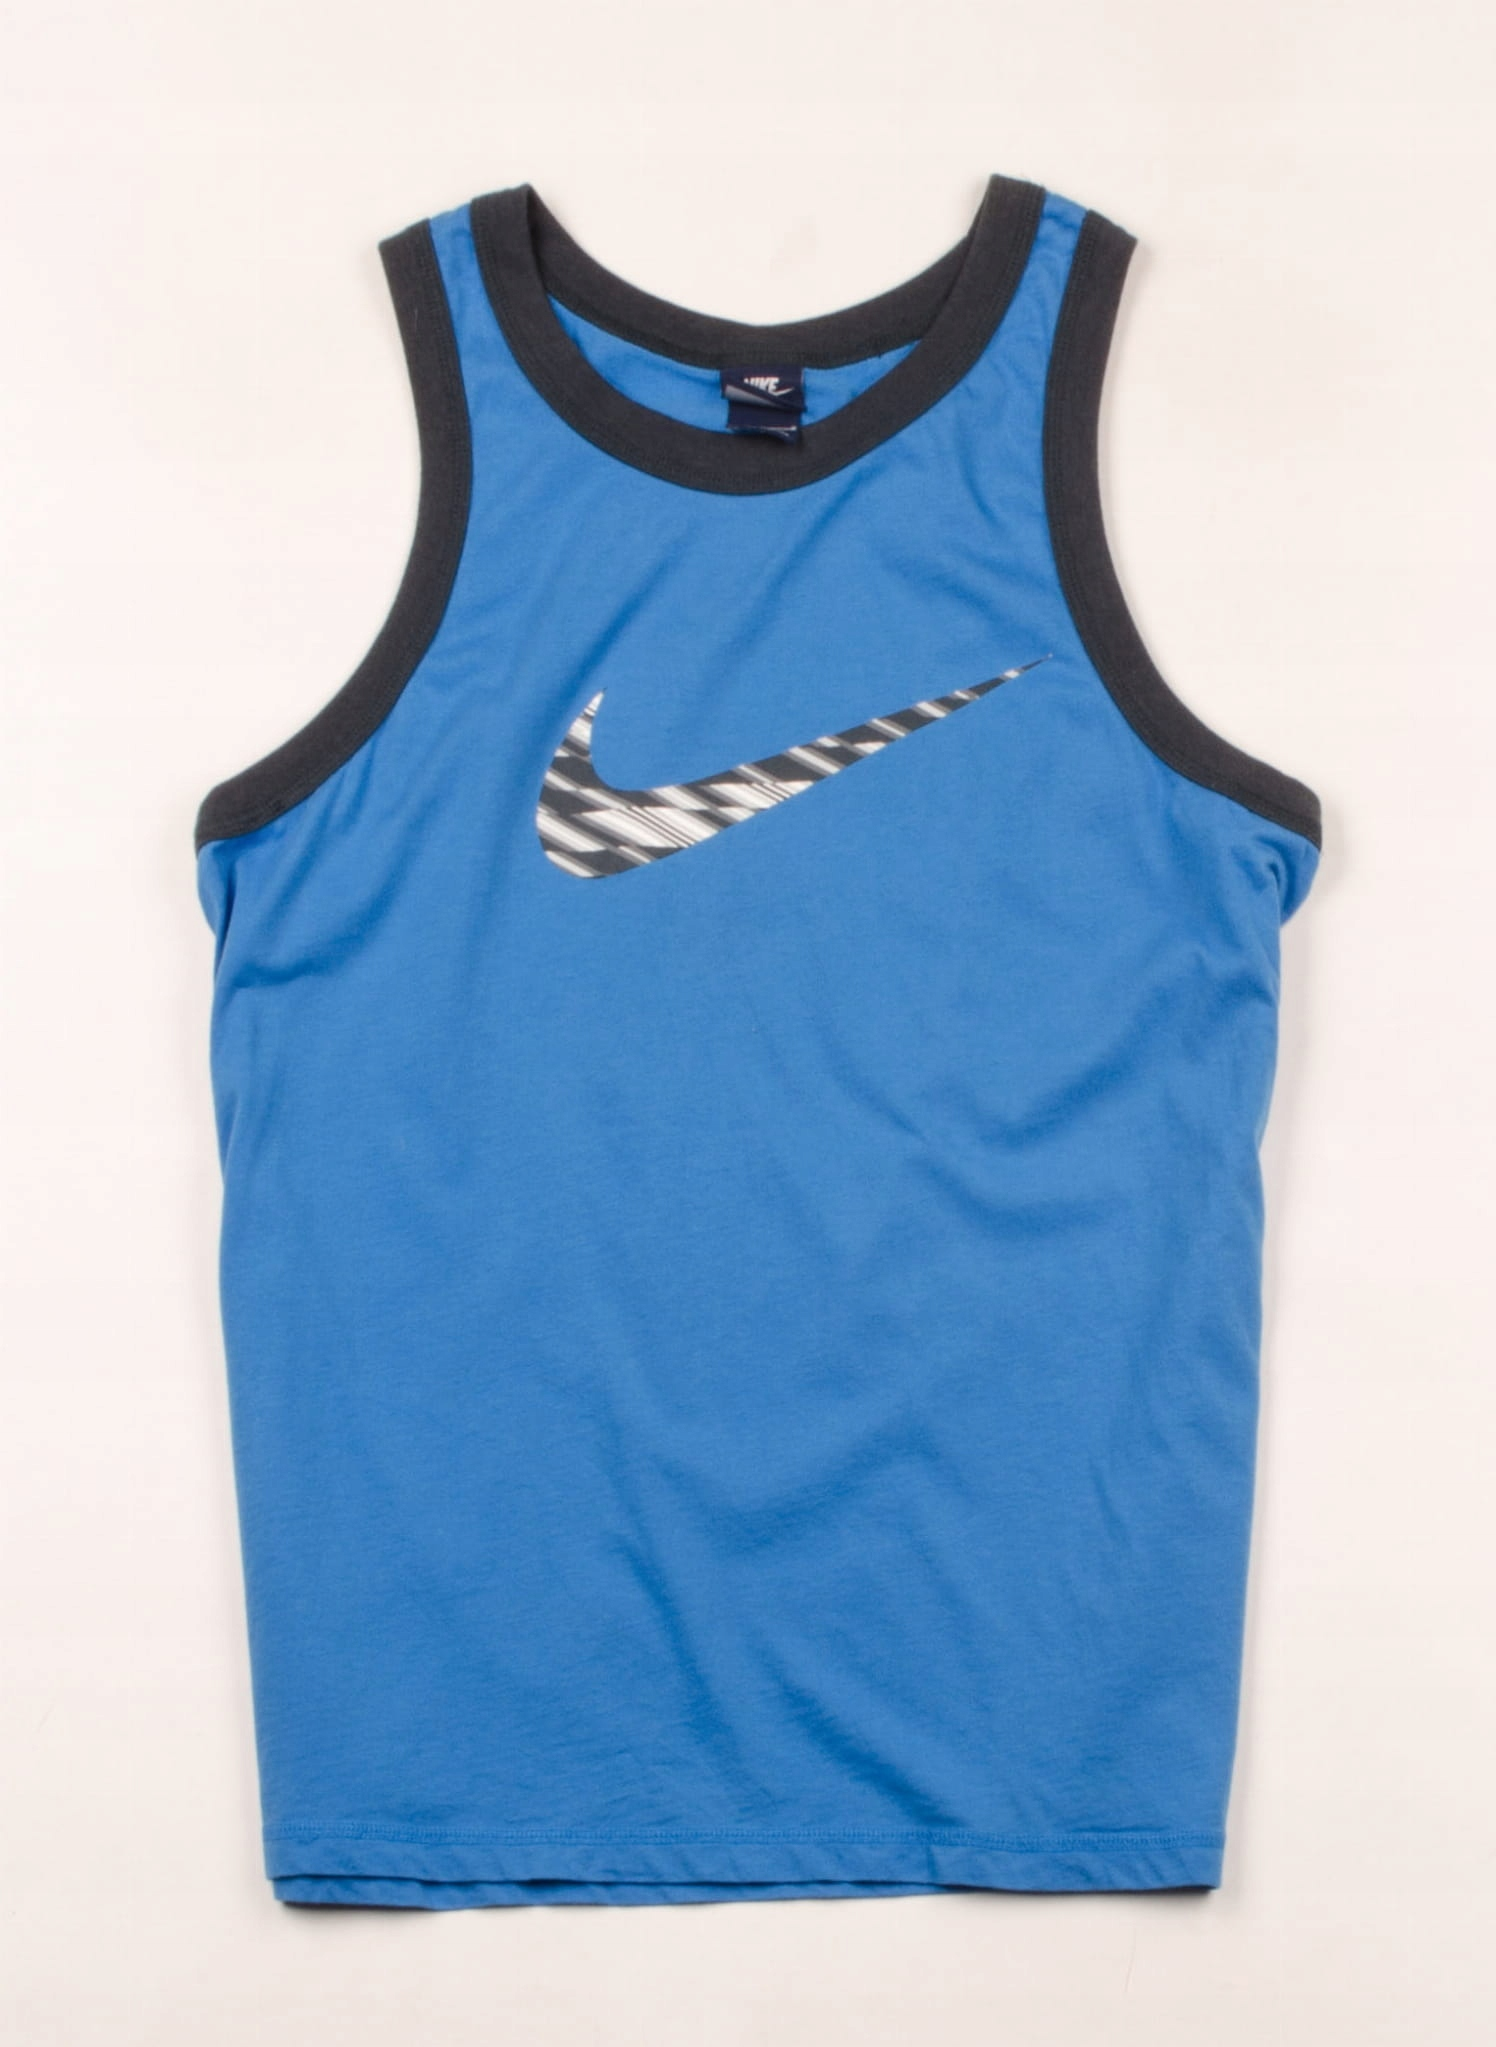 Nike Koszulka ramiączka Męska L